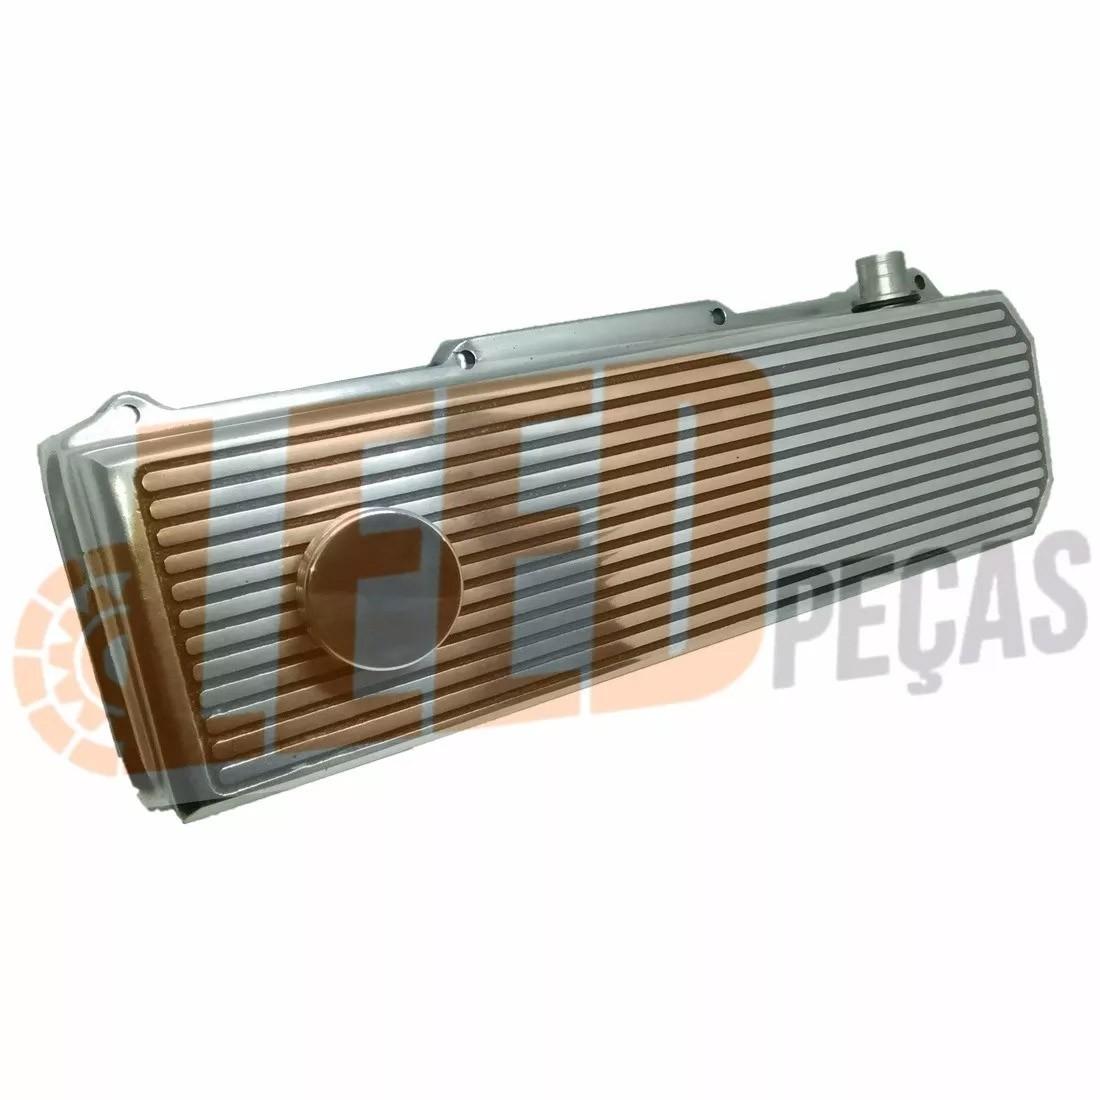 TAMPA COMANDO DE VALVULA (PRETA FOSCA) MOTOR AP VW 1.6 1.8 2.0 8V